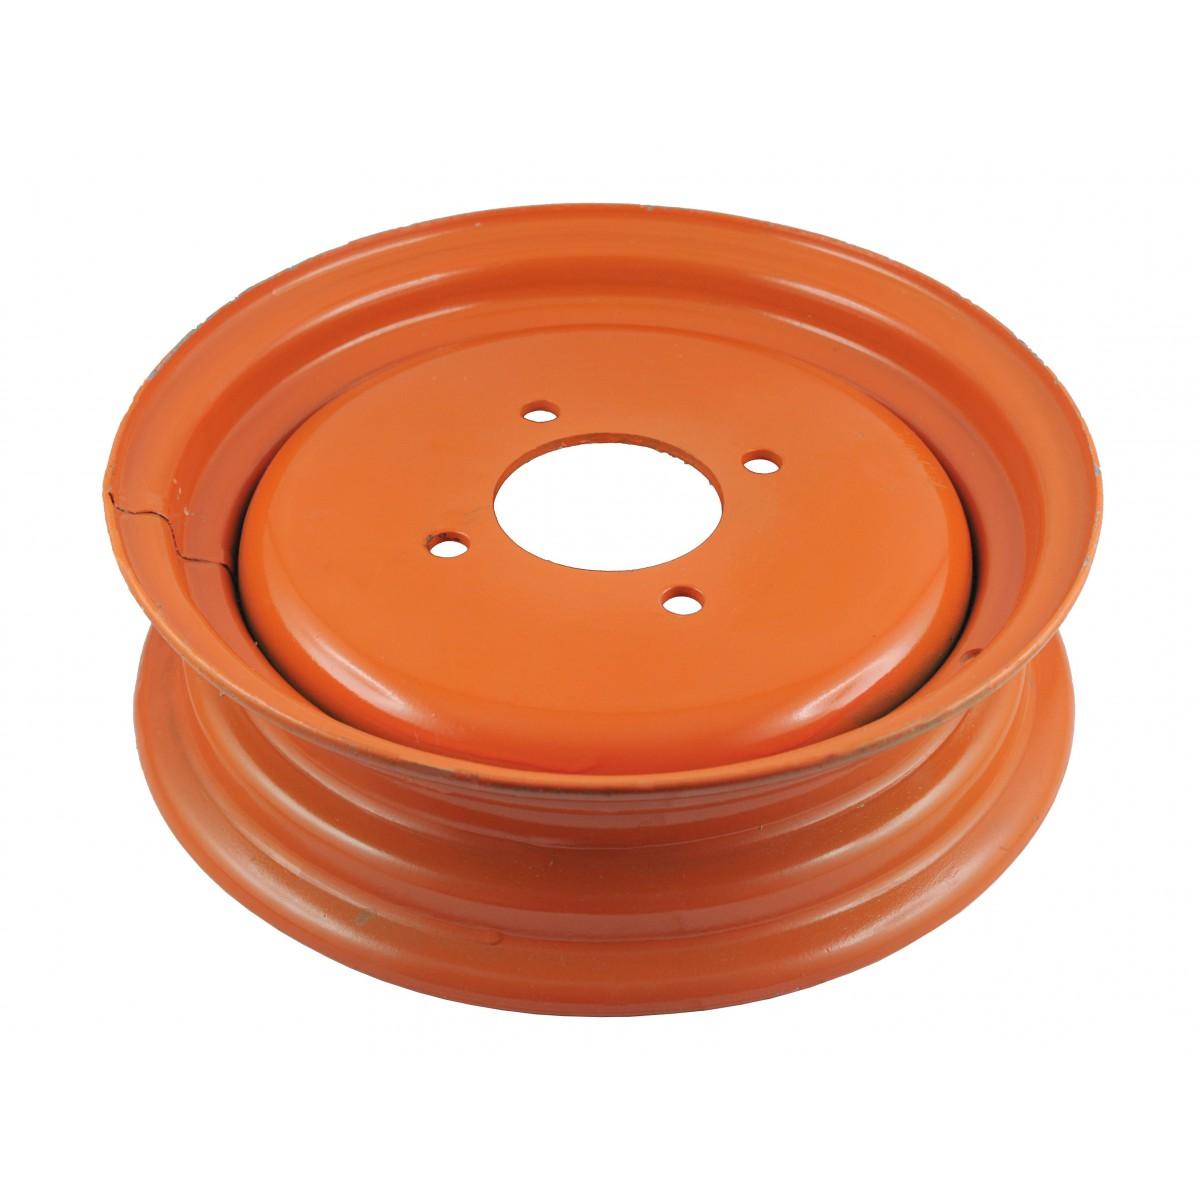 3.00-12 '(500-12) wheel rim 4 connectors (80 * 120) for YANMAR YM1401